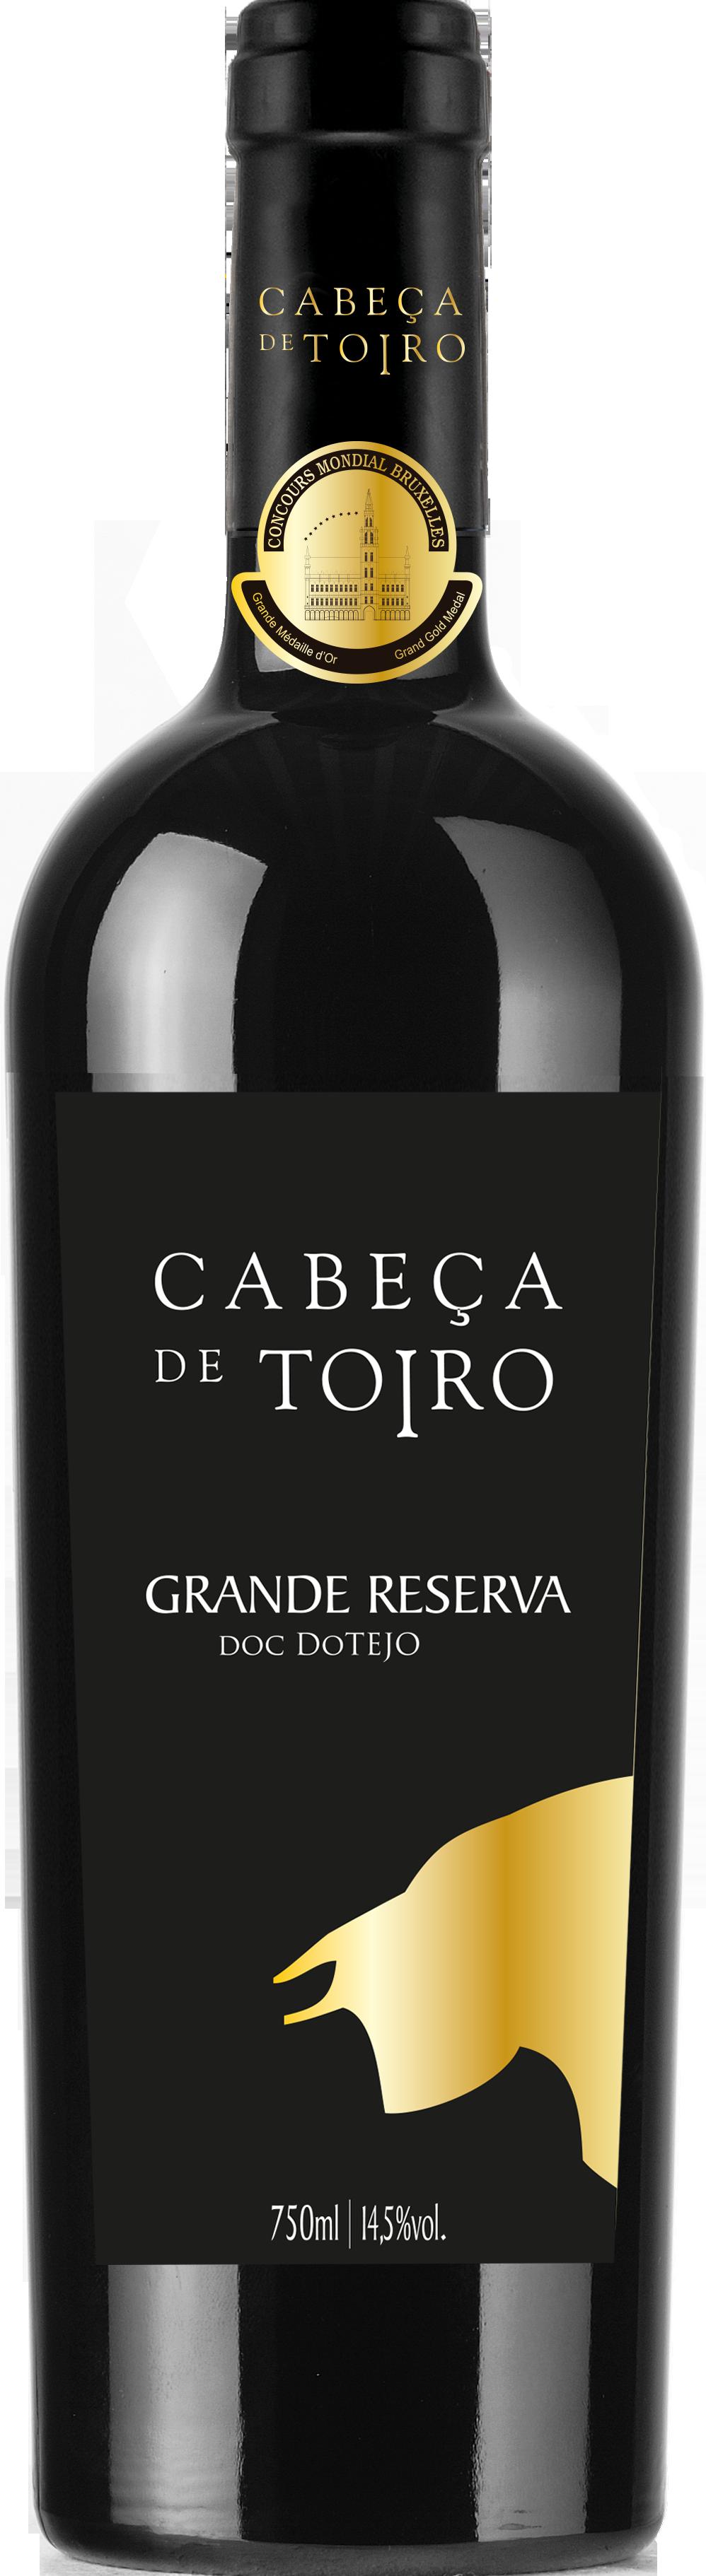 CABEÇADE TOIRO-GRANDE RESERVA –RED WINE